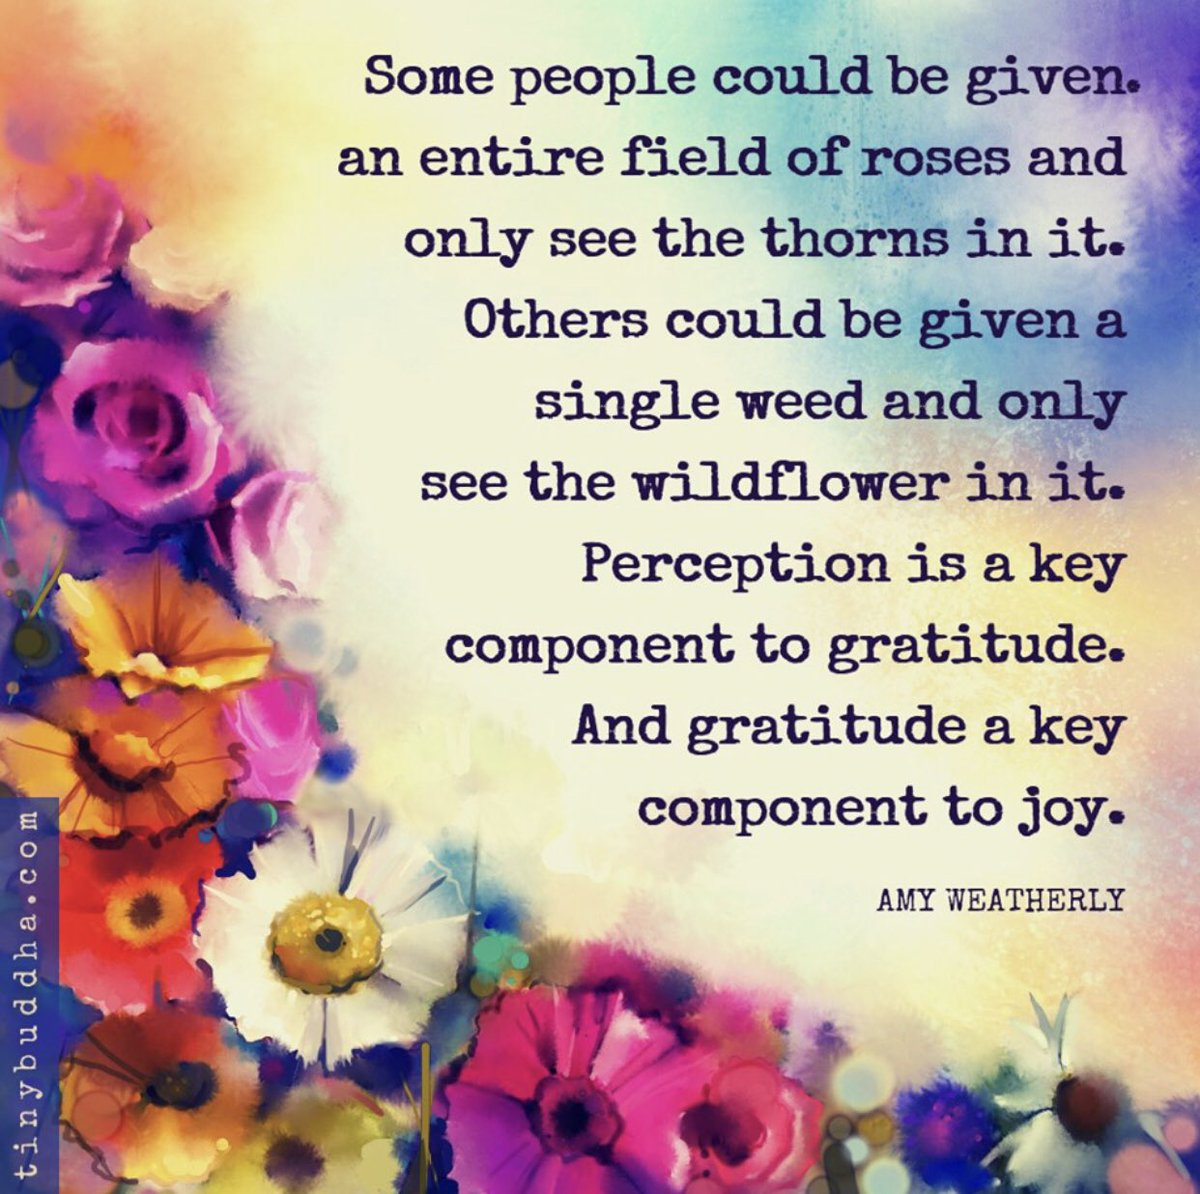 Perception. . . Gratitude. . . Joy 🥰 #LoveLiteracyLearning